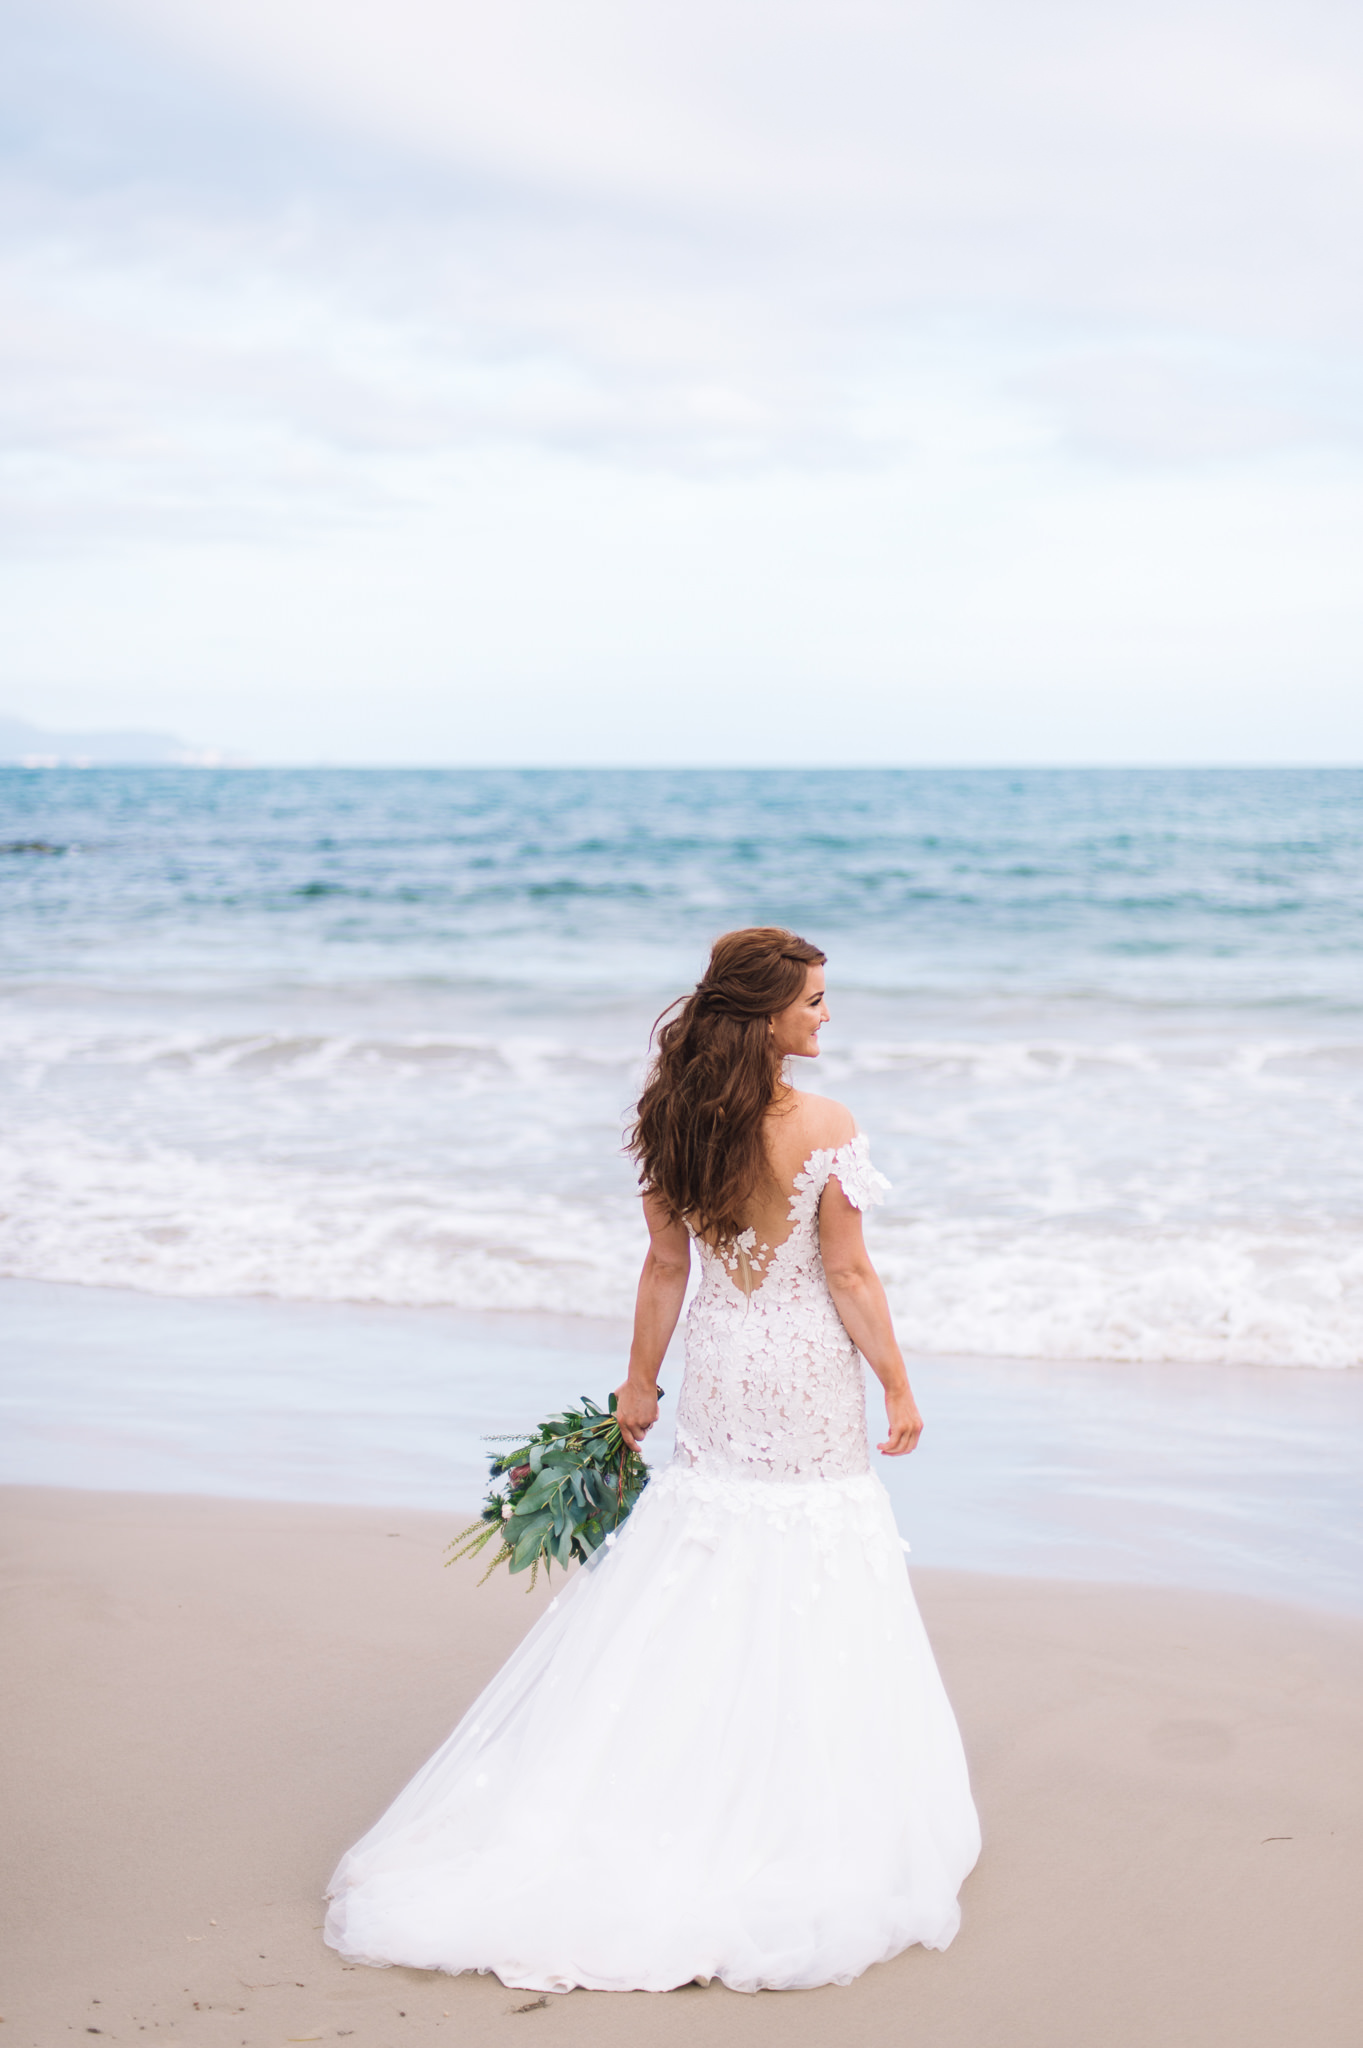 Beautiful Nurit Hen gown on Avalon Coastal Retreat's private beach